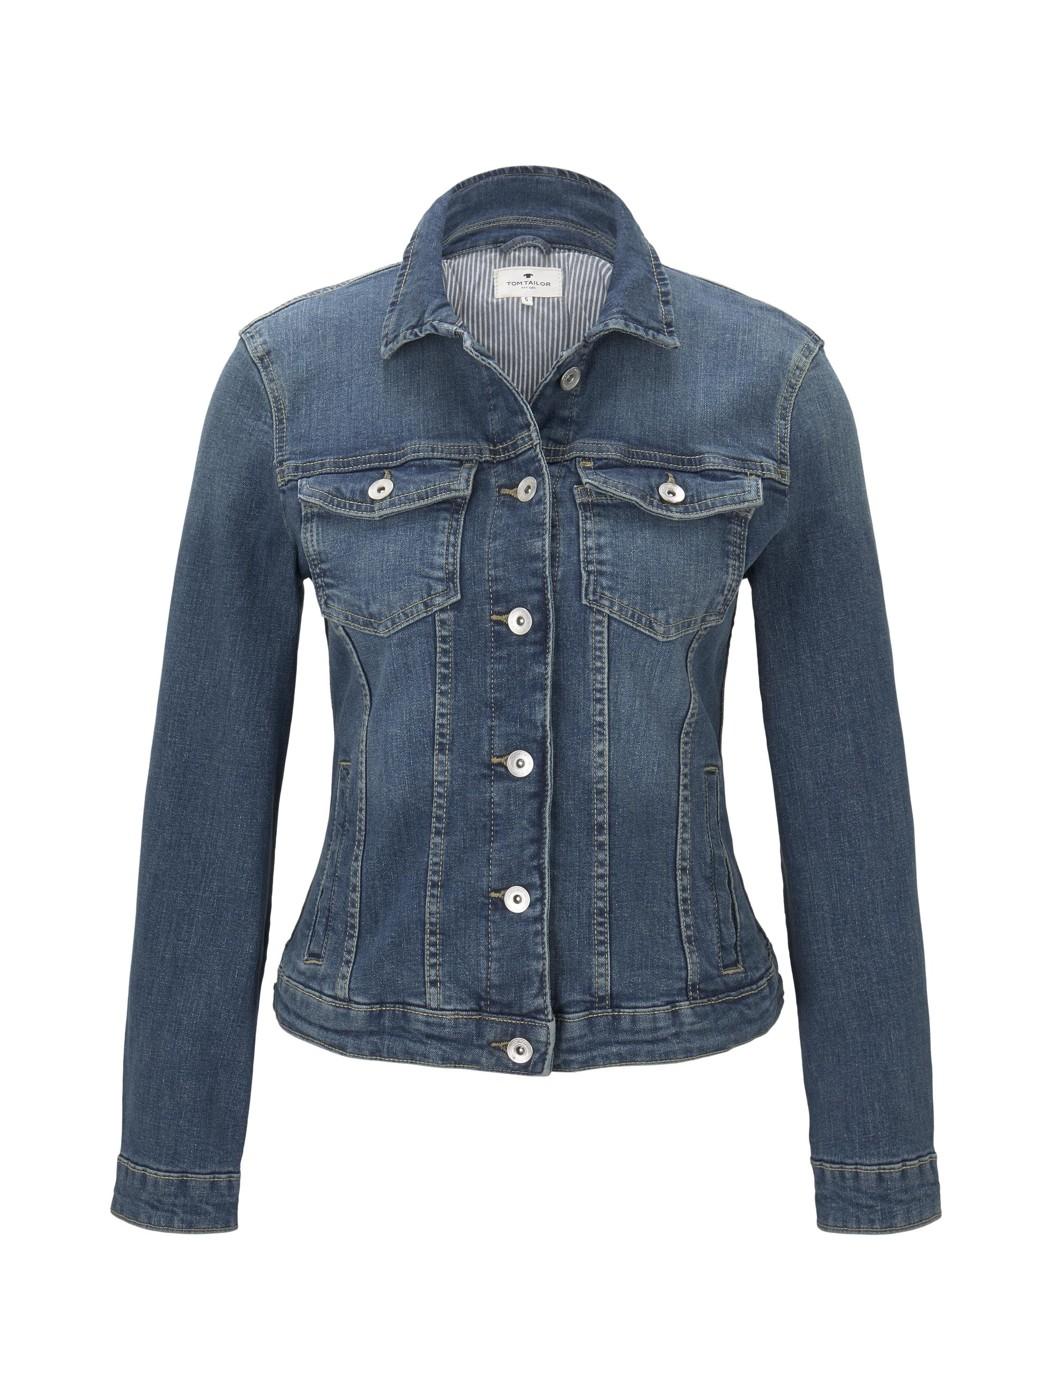 authentic denim jacket - Damen